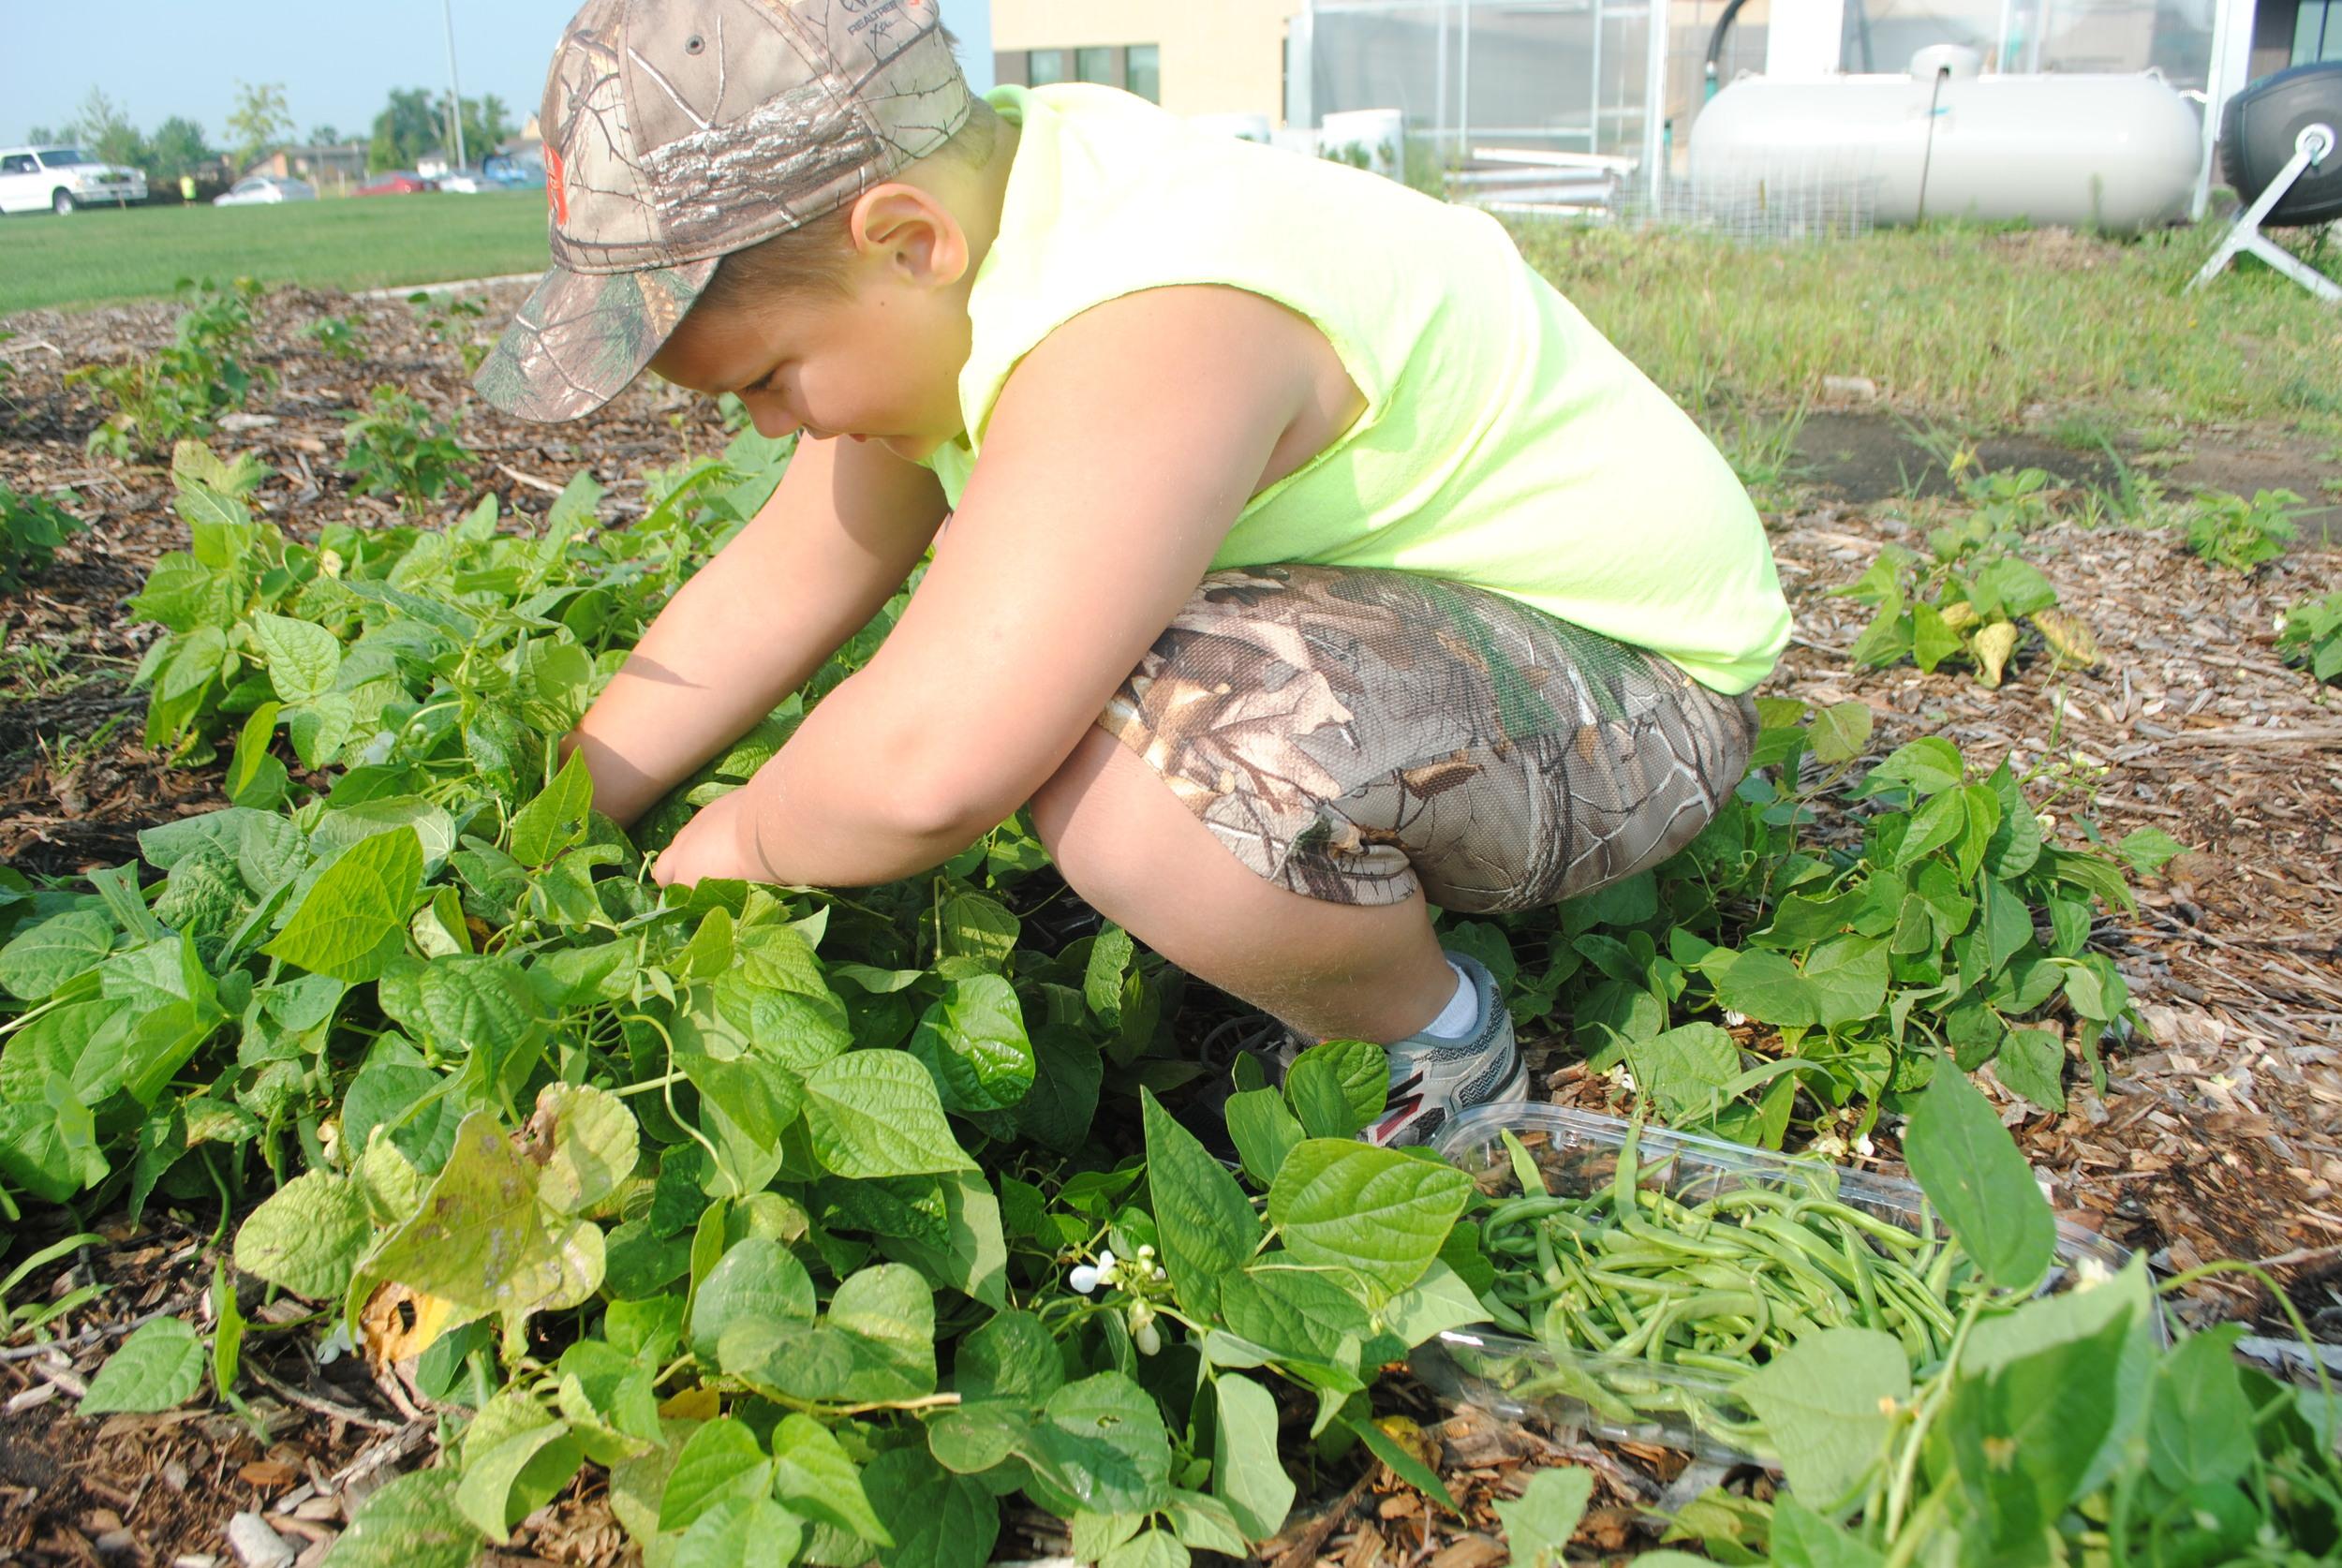 Carter Worden, 7, picks green beans in the school garden. Carter said picking beans is his favorite to pick in the garden.